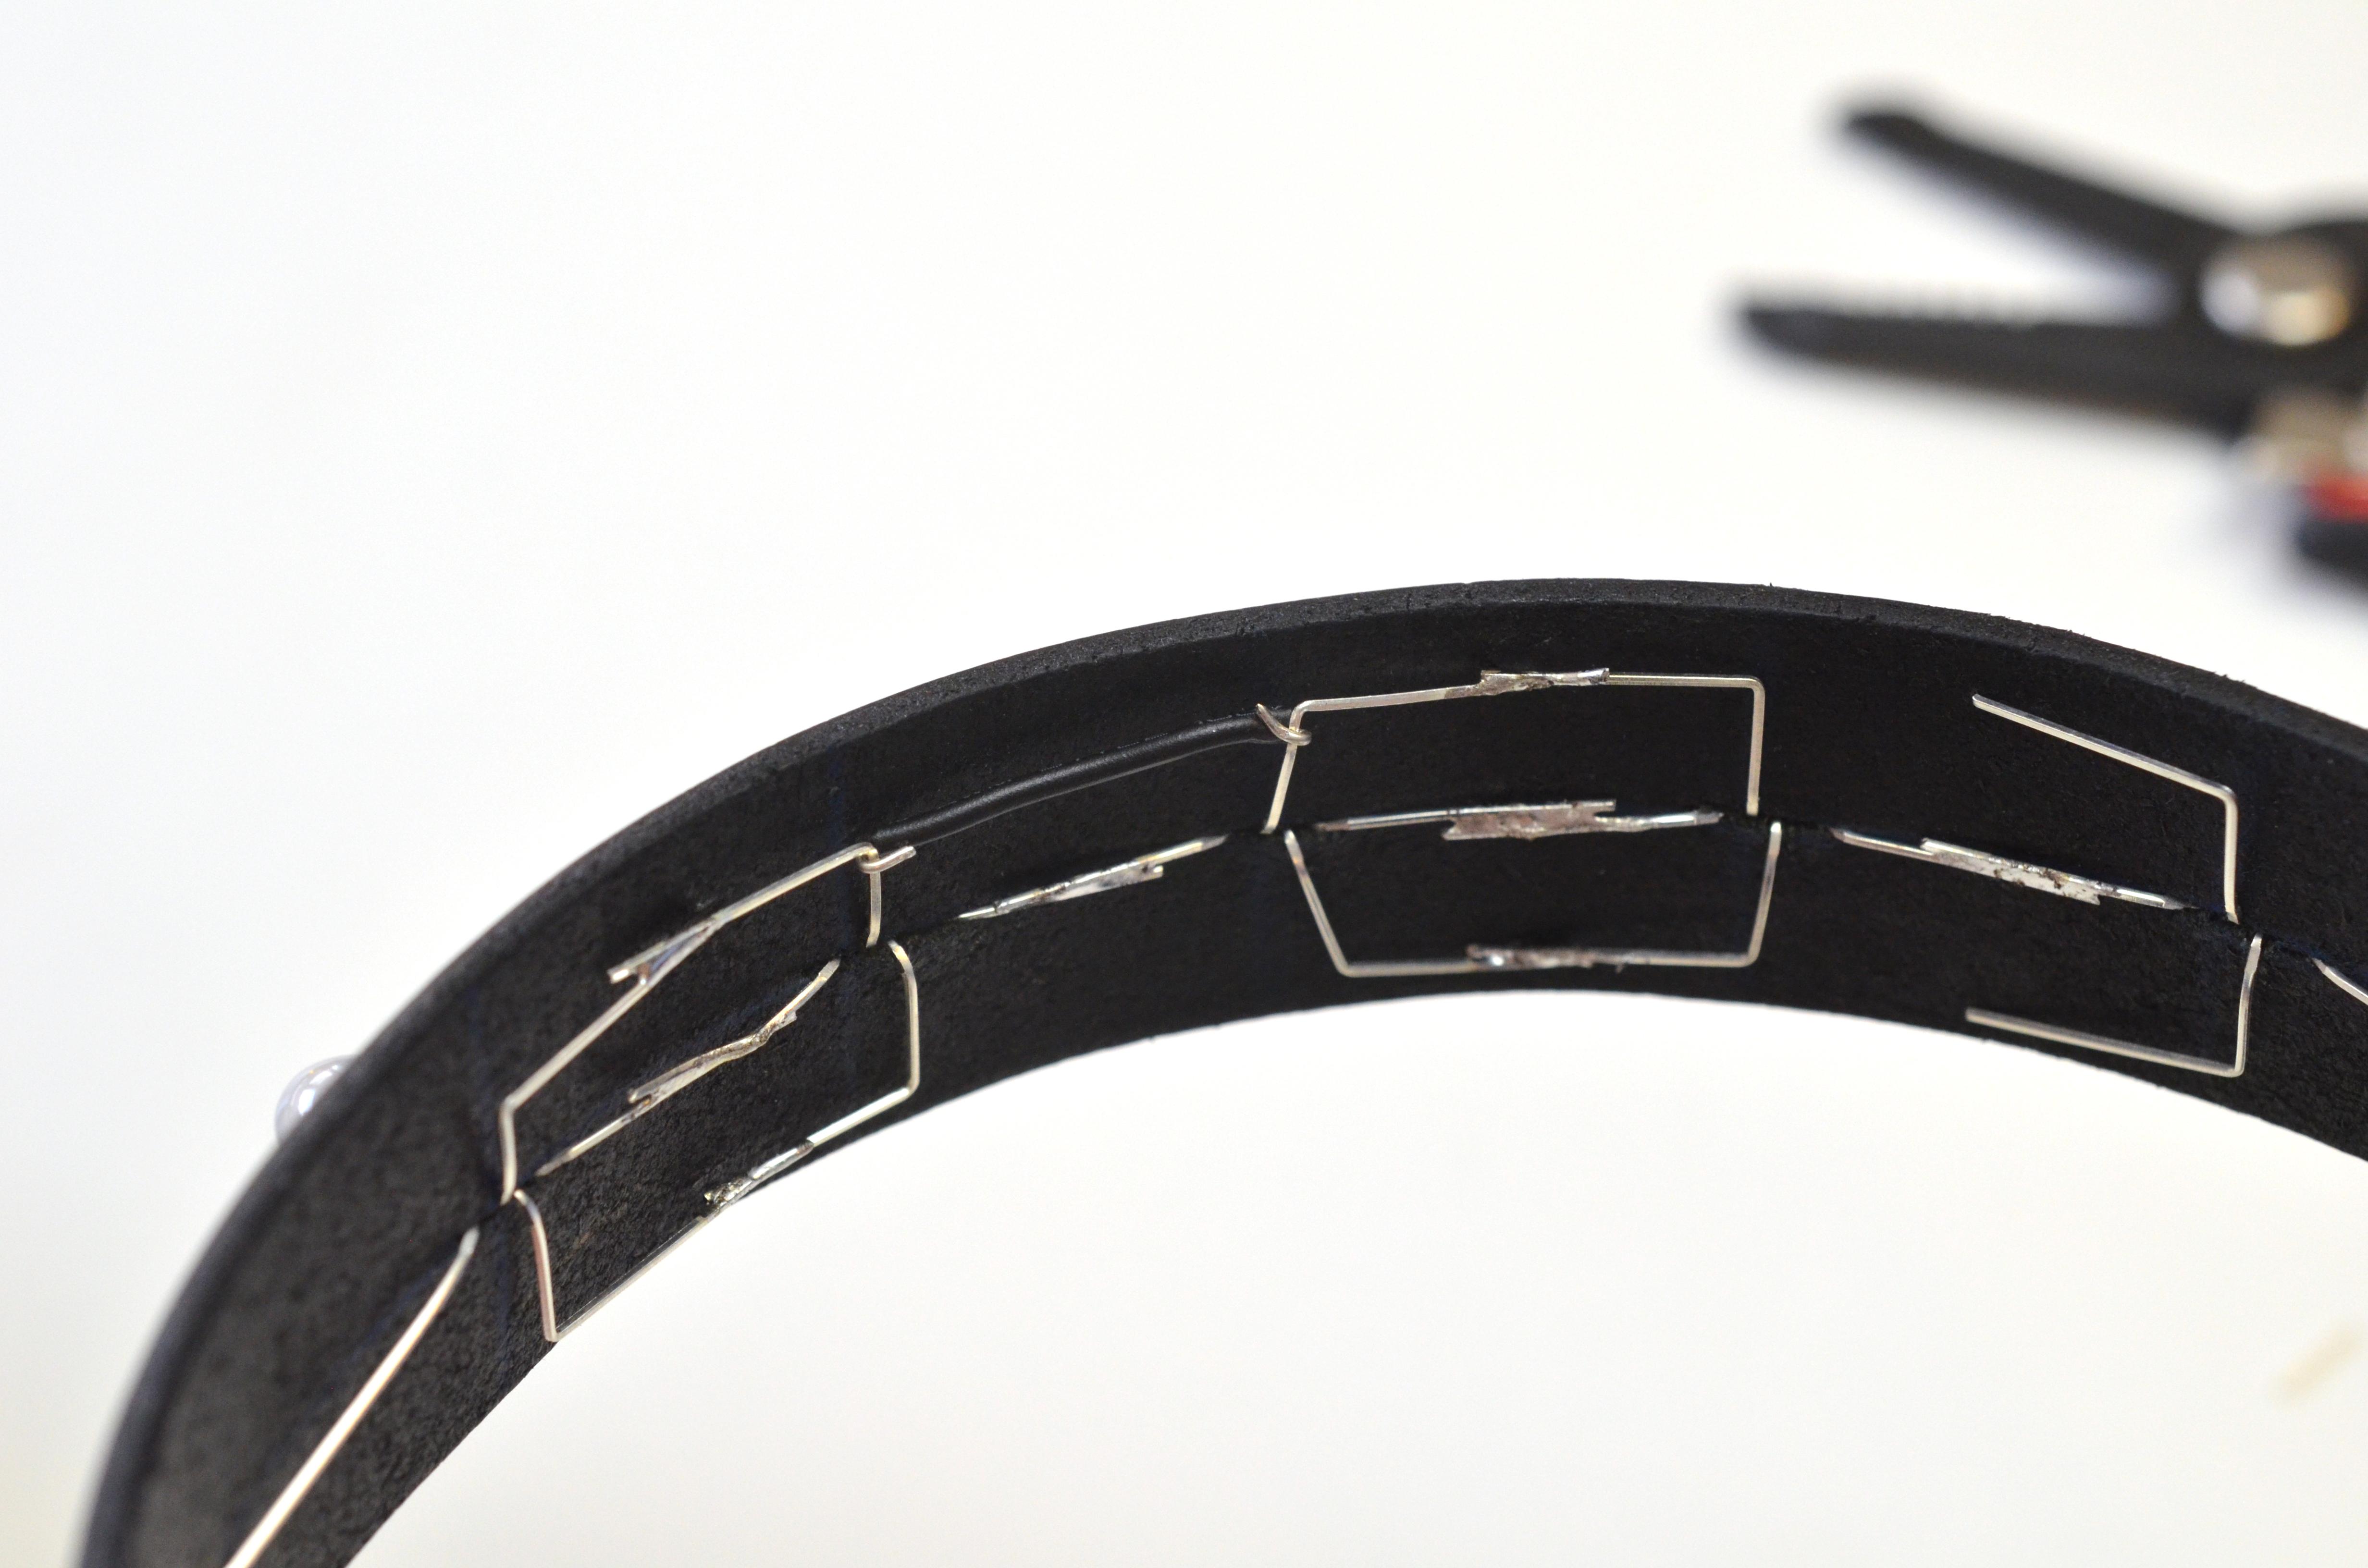 led_pixels_neopixel-punk-collar-11.jpg